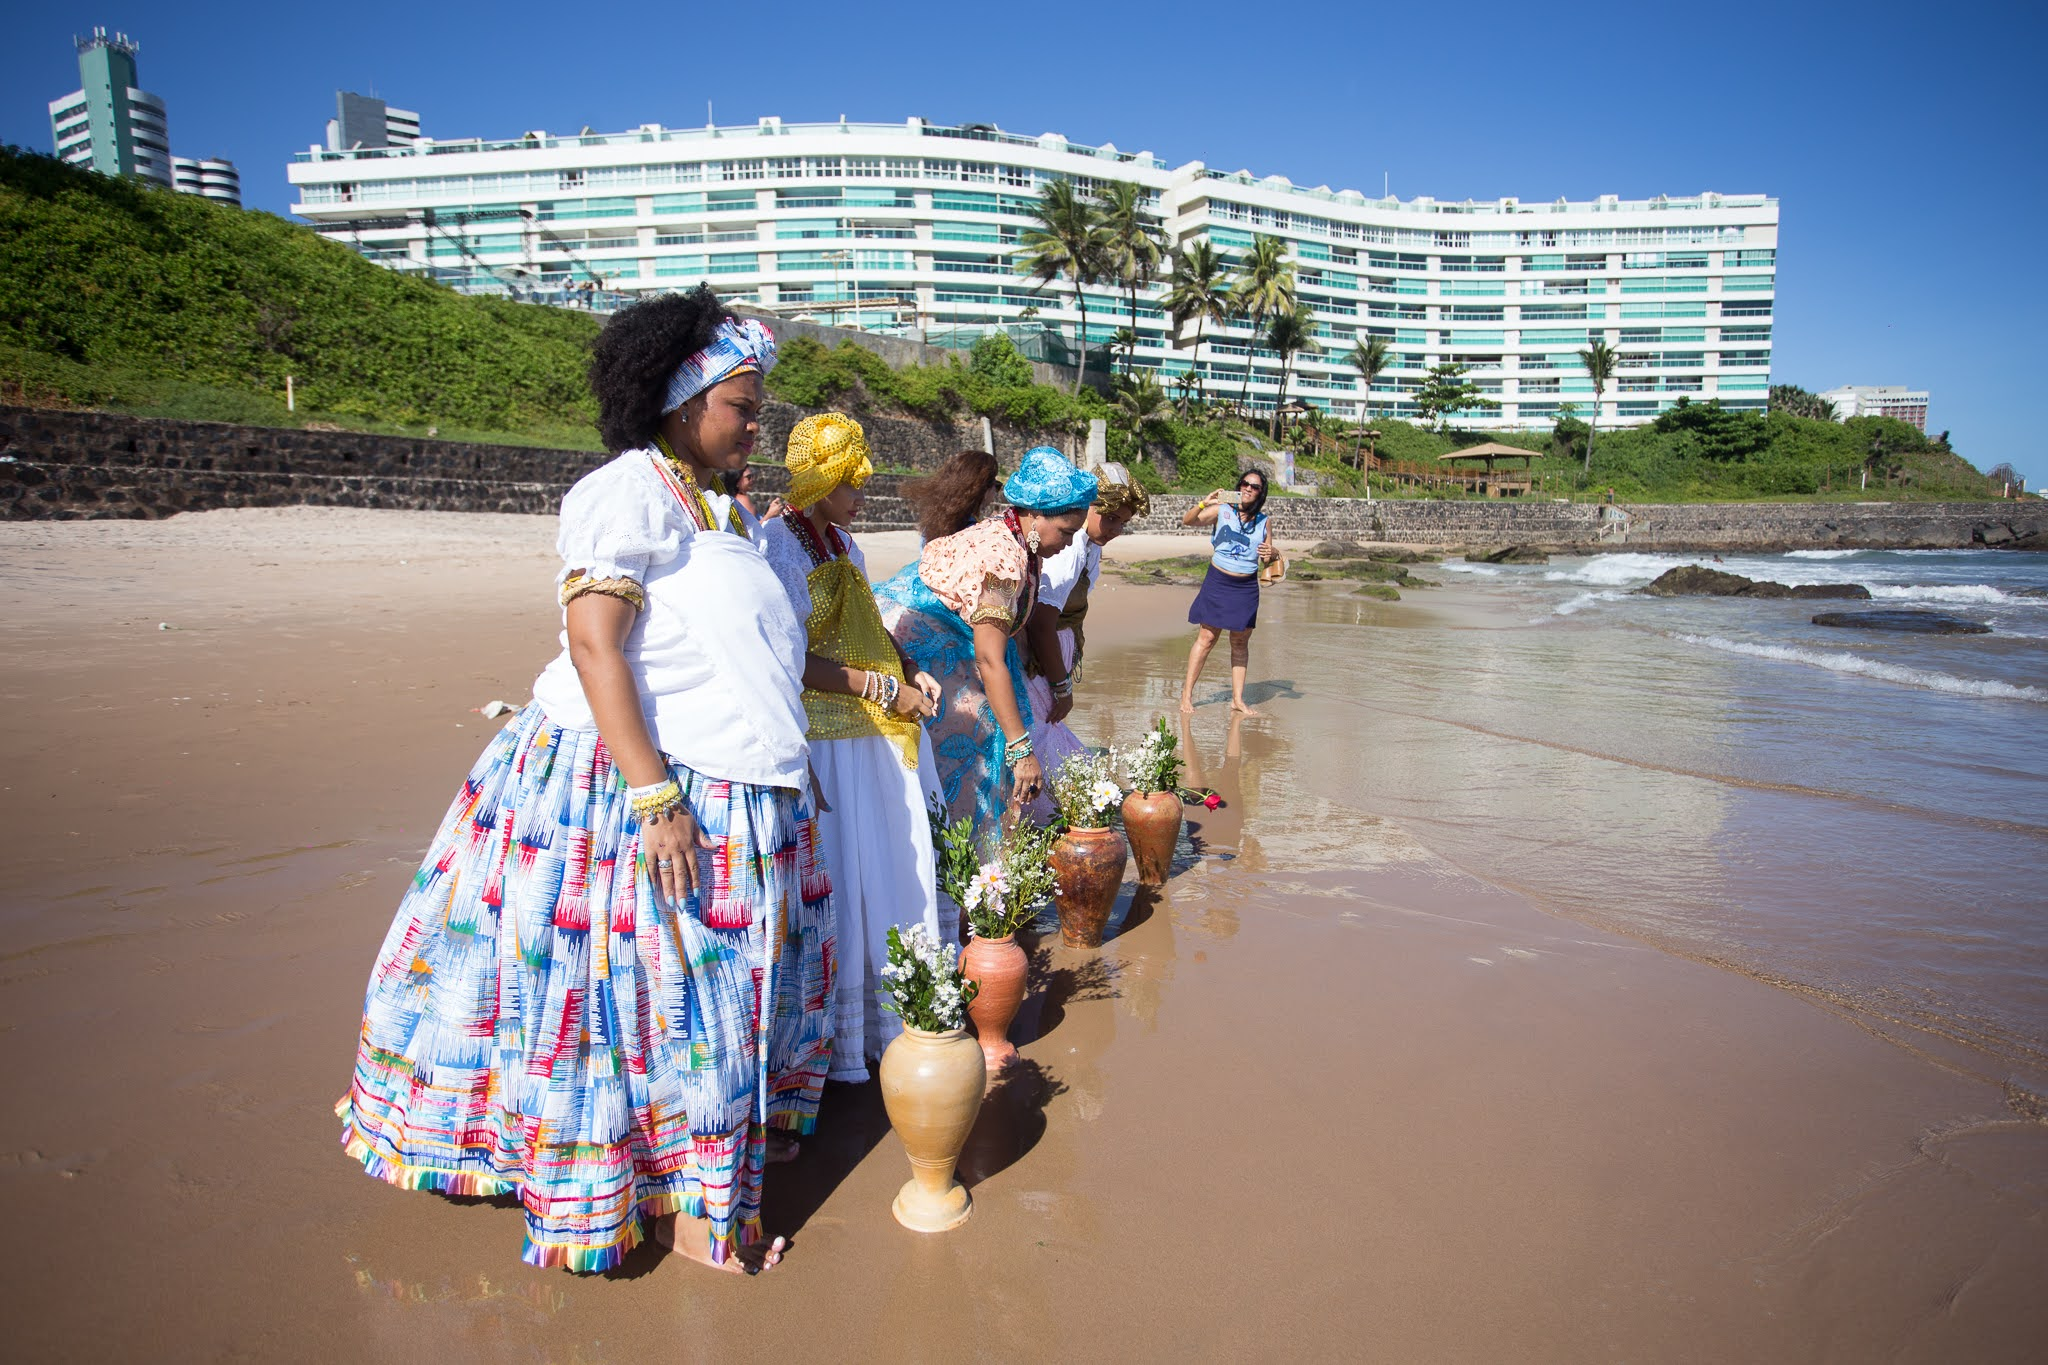 Lavagem Maria Fumaça – Feijoada da Rainha 2020